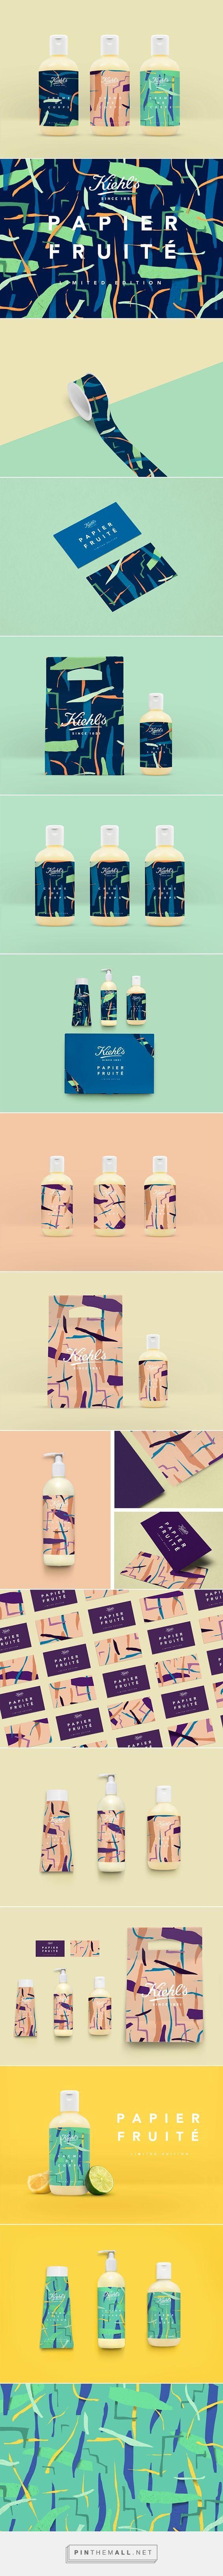 Kiehl's  Papier Fruité Packaging on Behance by Don't Try Studio   Fivestar Branding – Design and Branding Agency & Inspiration Gallery